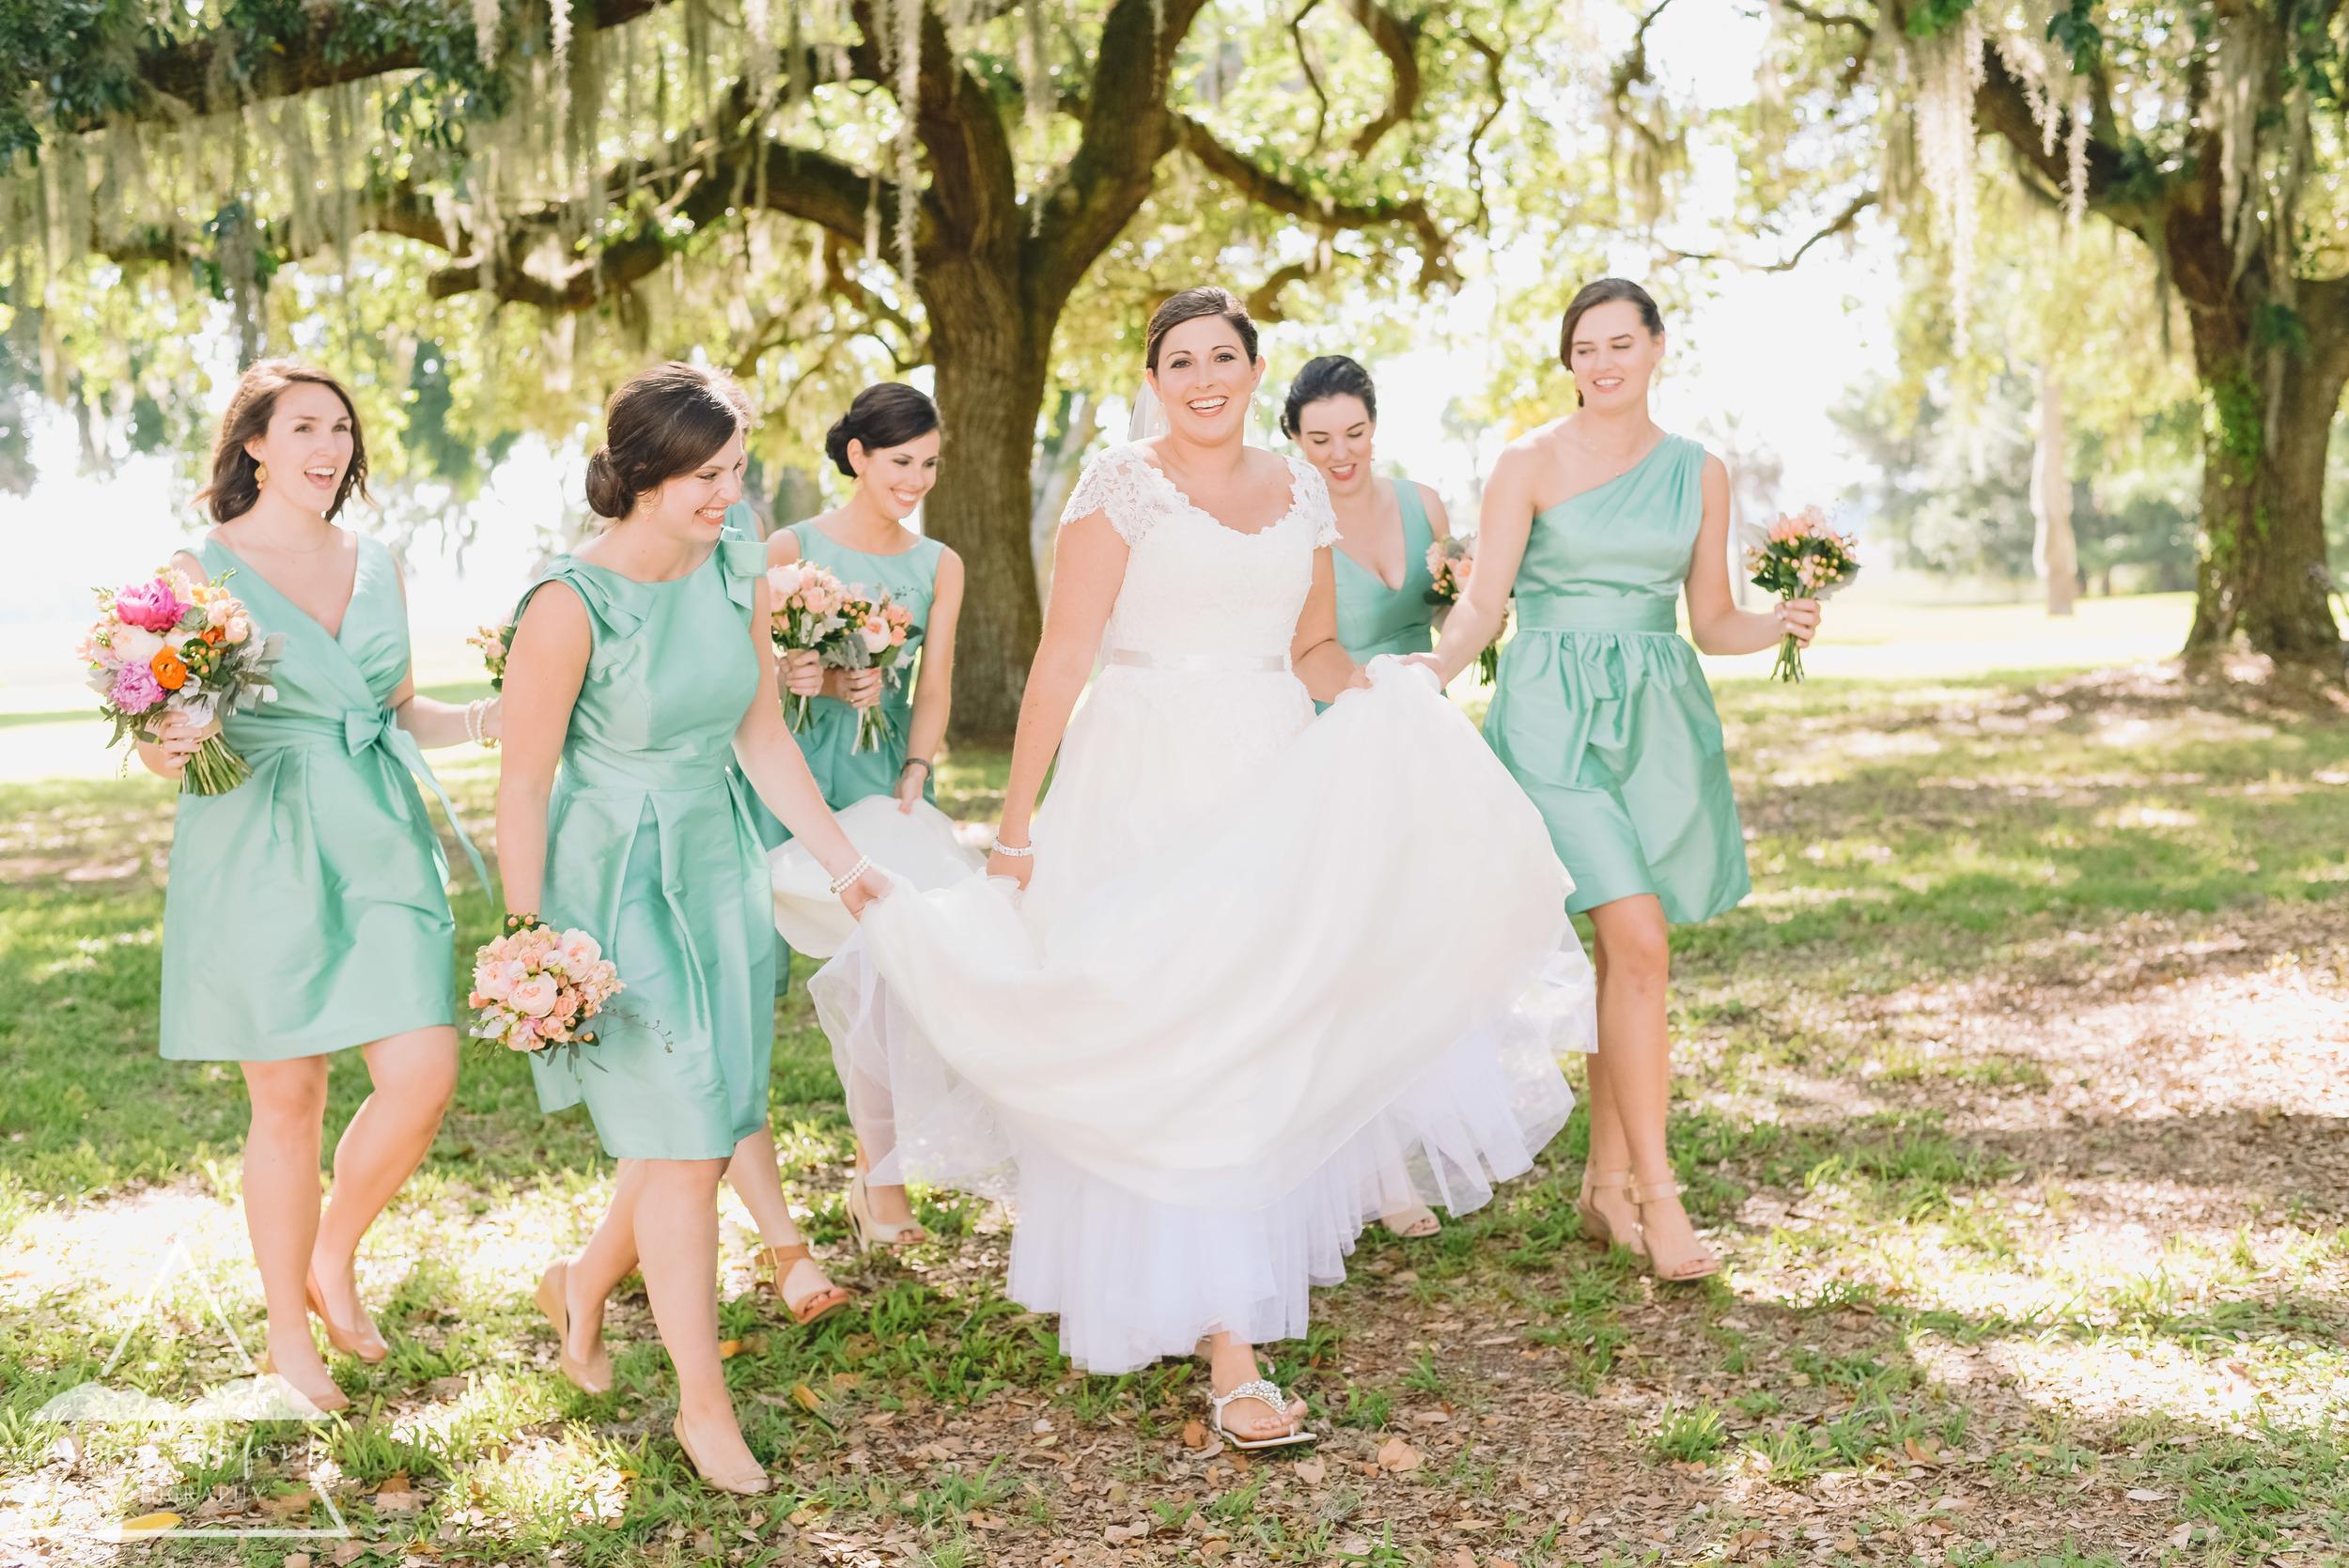 Clarkson_wedding_web-36.jpg